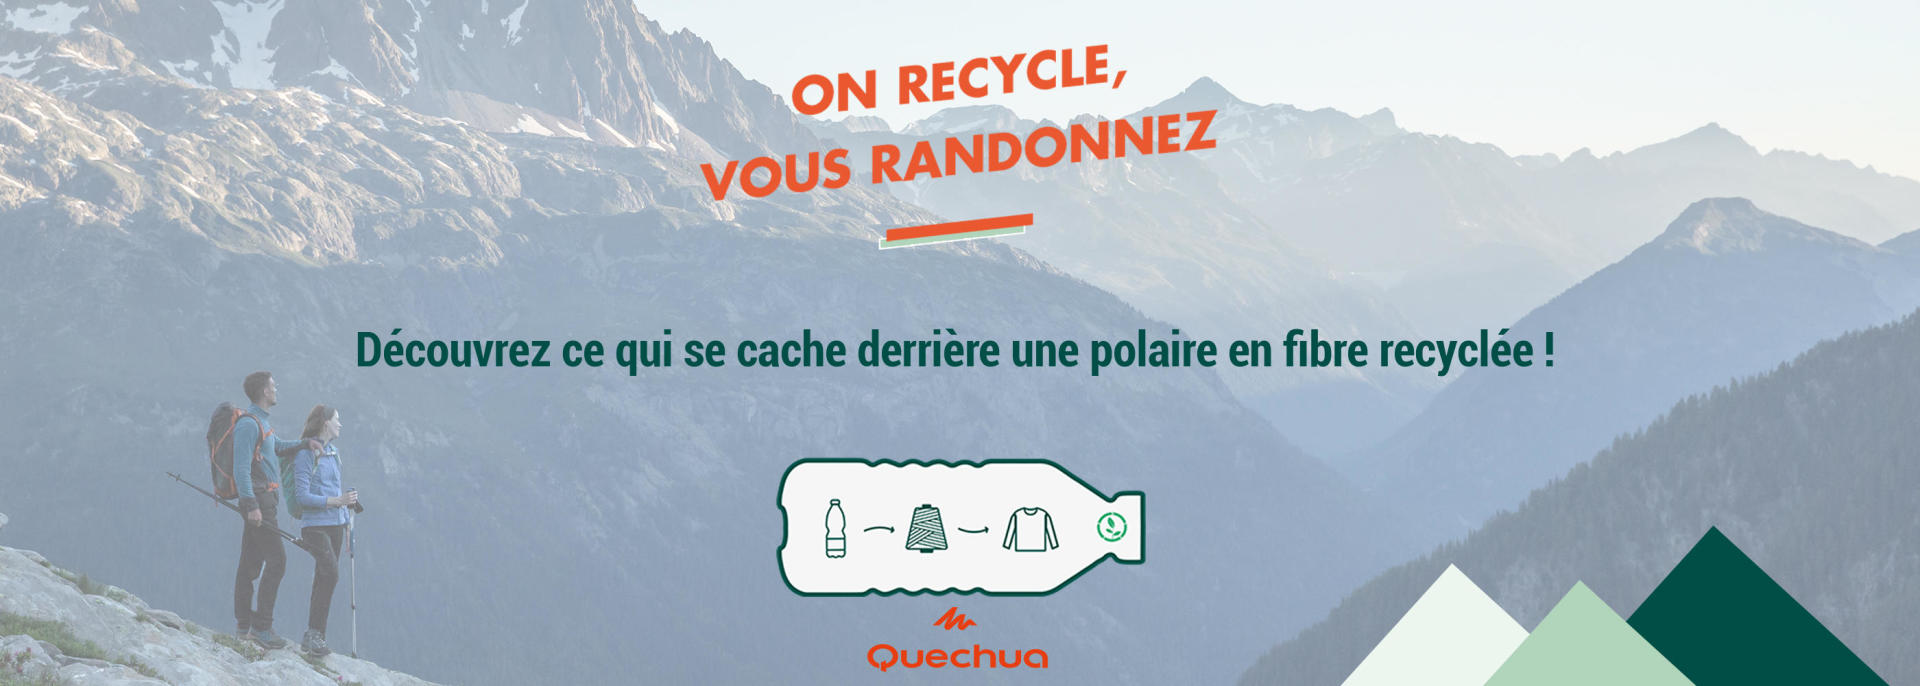 Polaires Recyclées Quechua